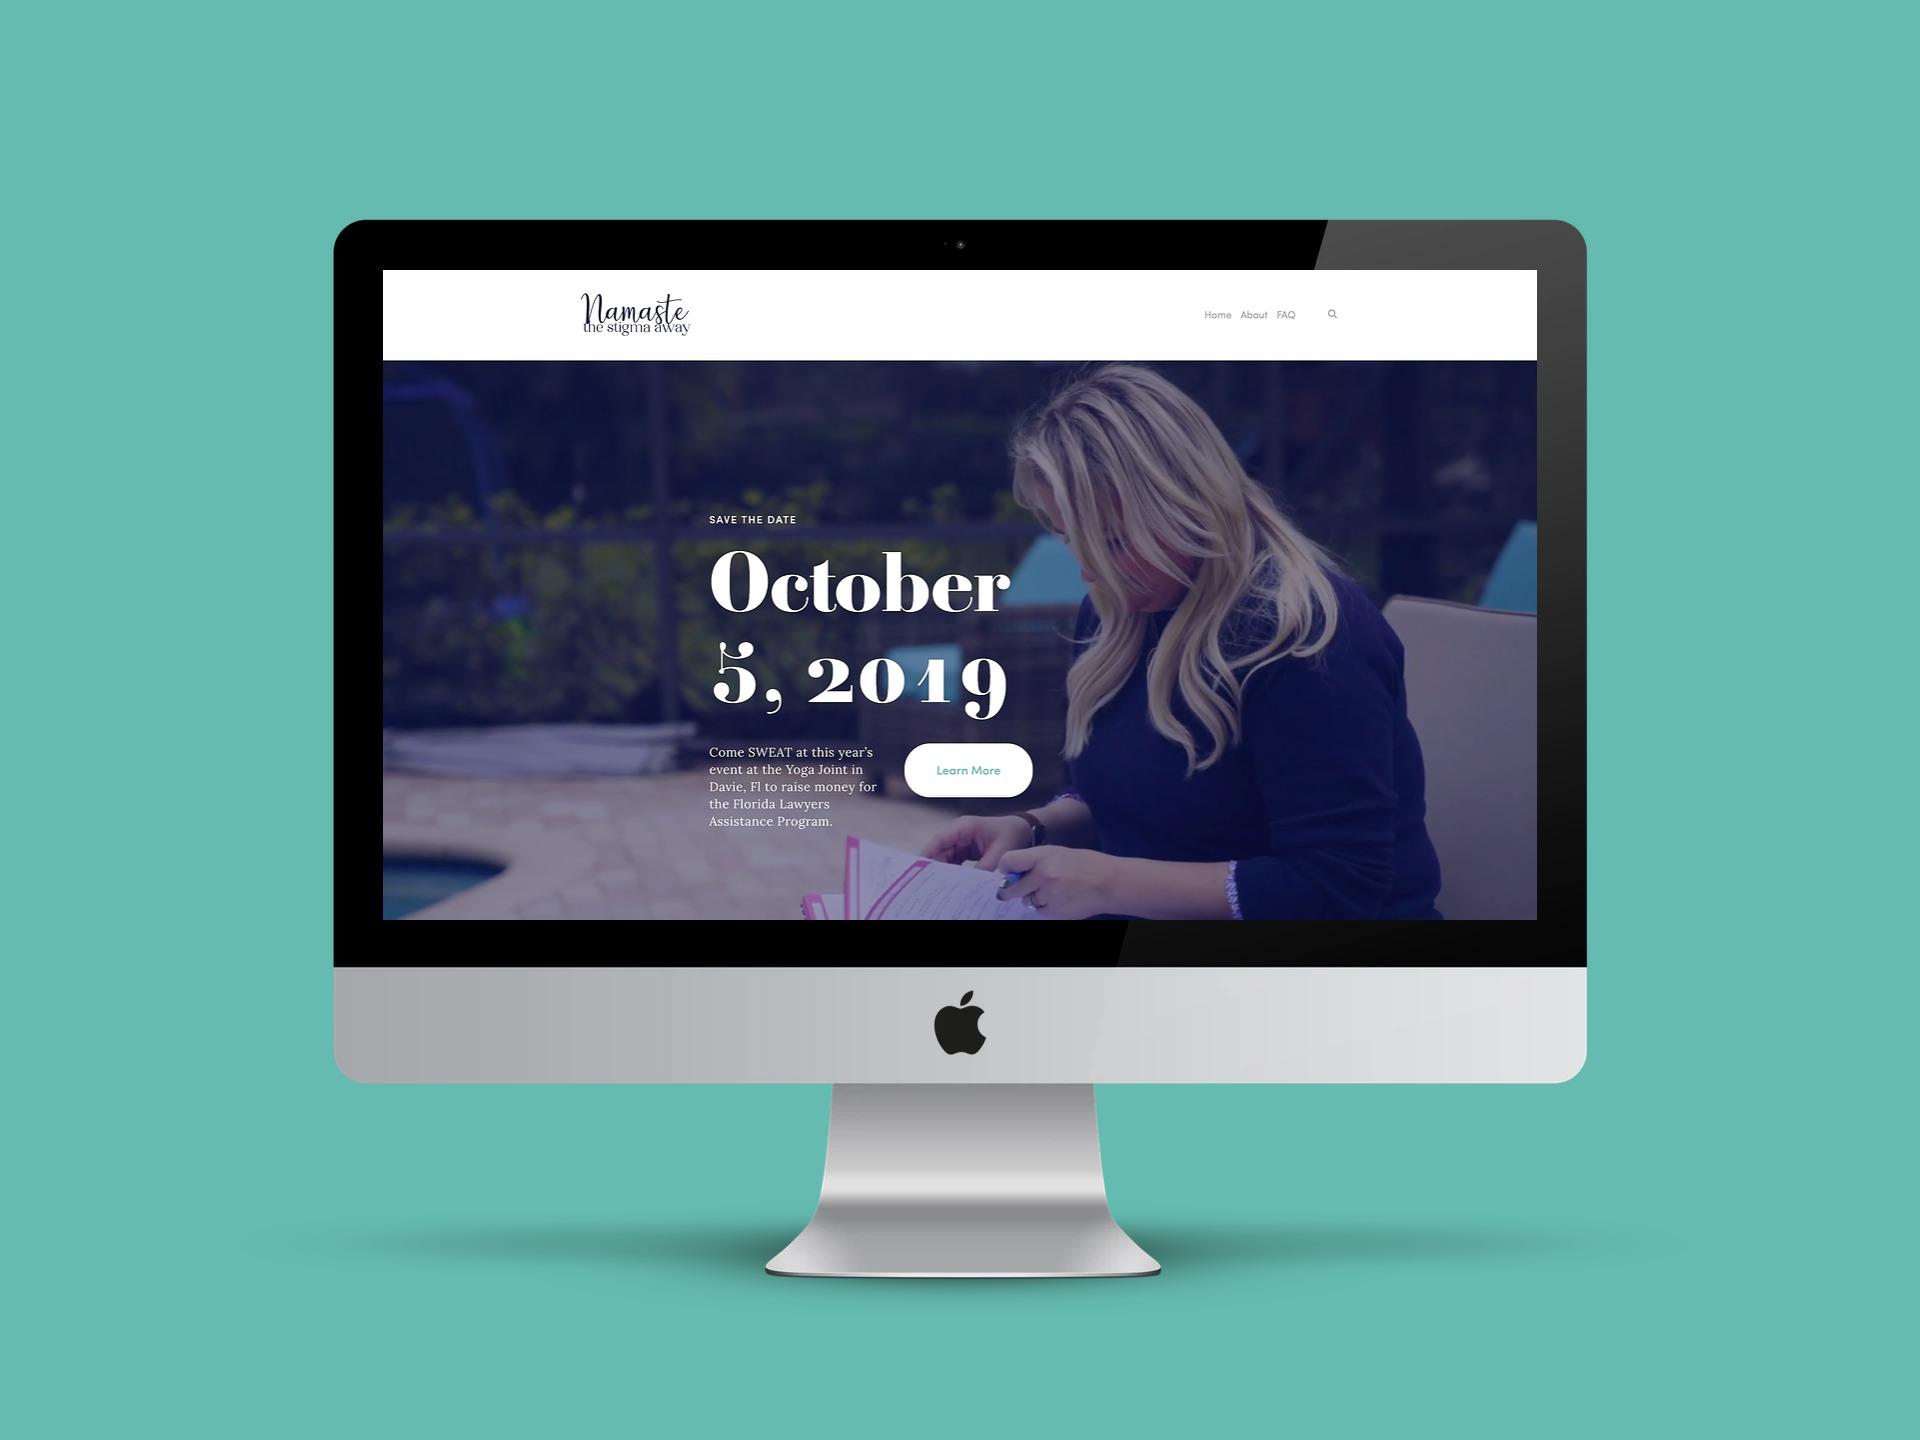 namaste-the-stigma-website.jpg